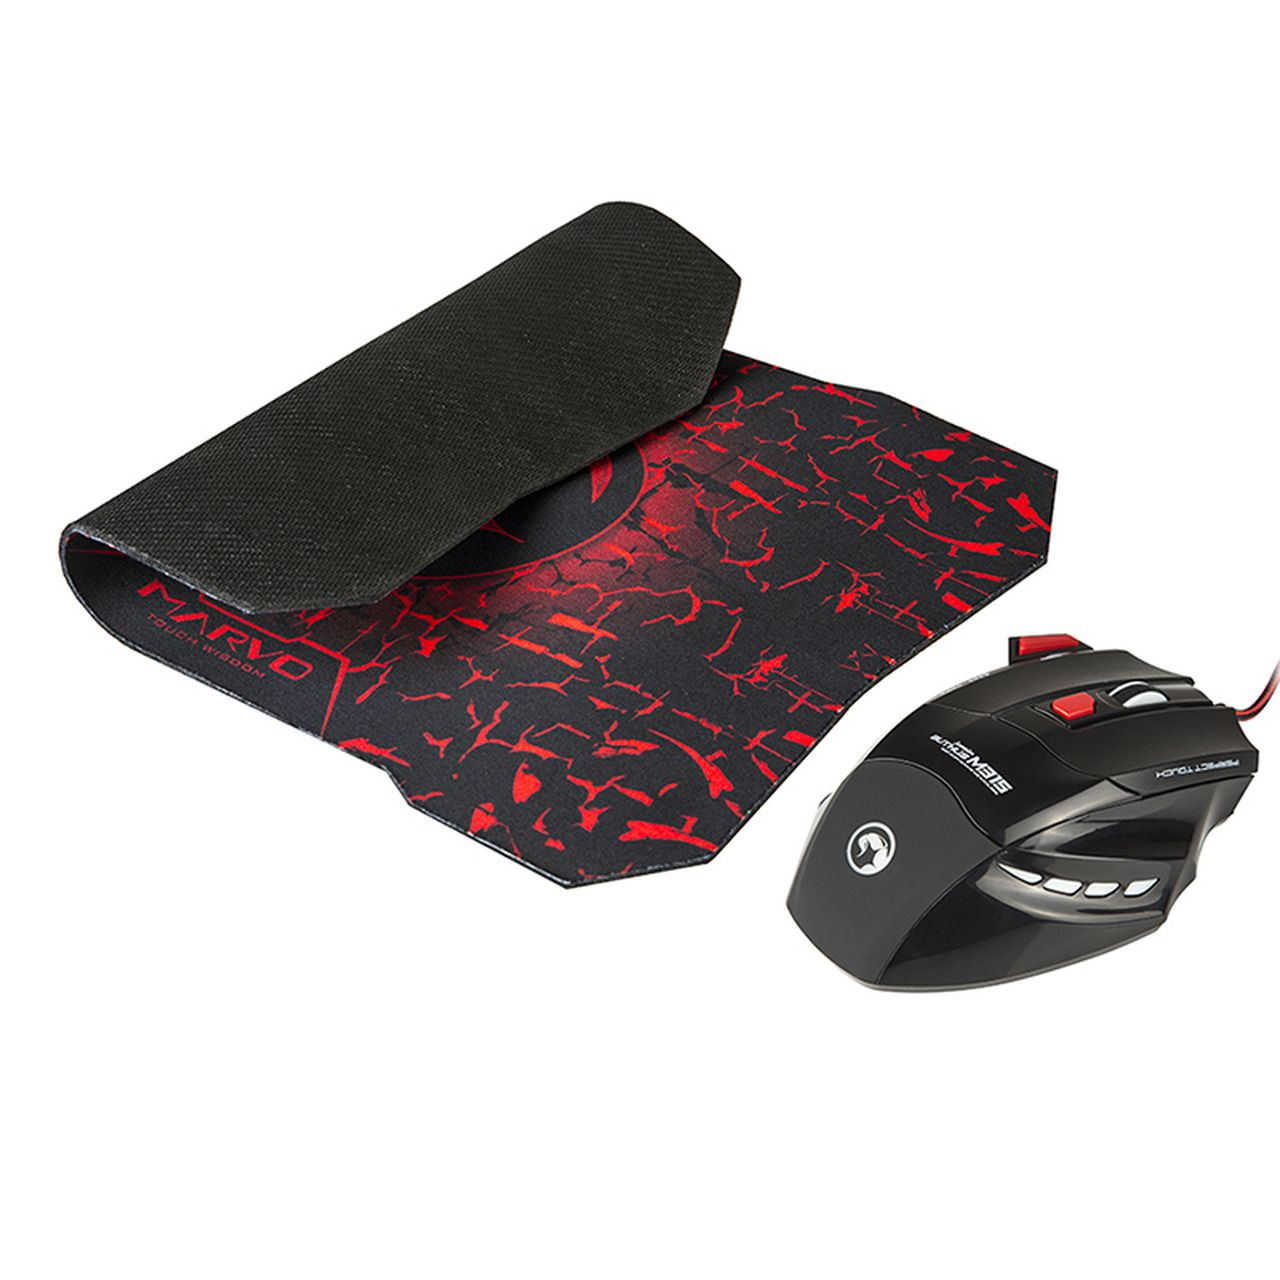 Combo Gamer Mouse e Mouse Pad M315G1 Scorpion